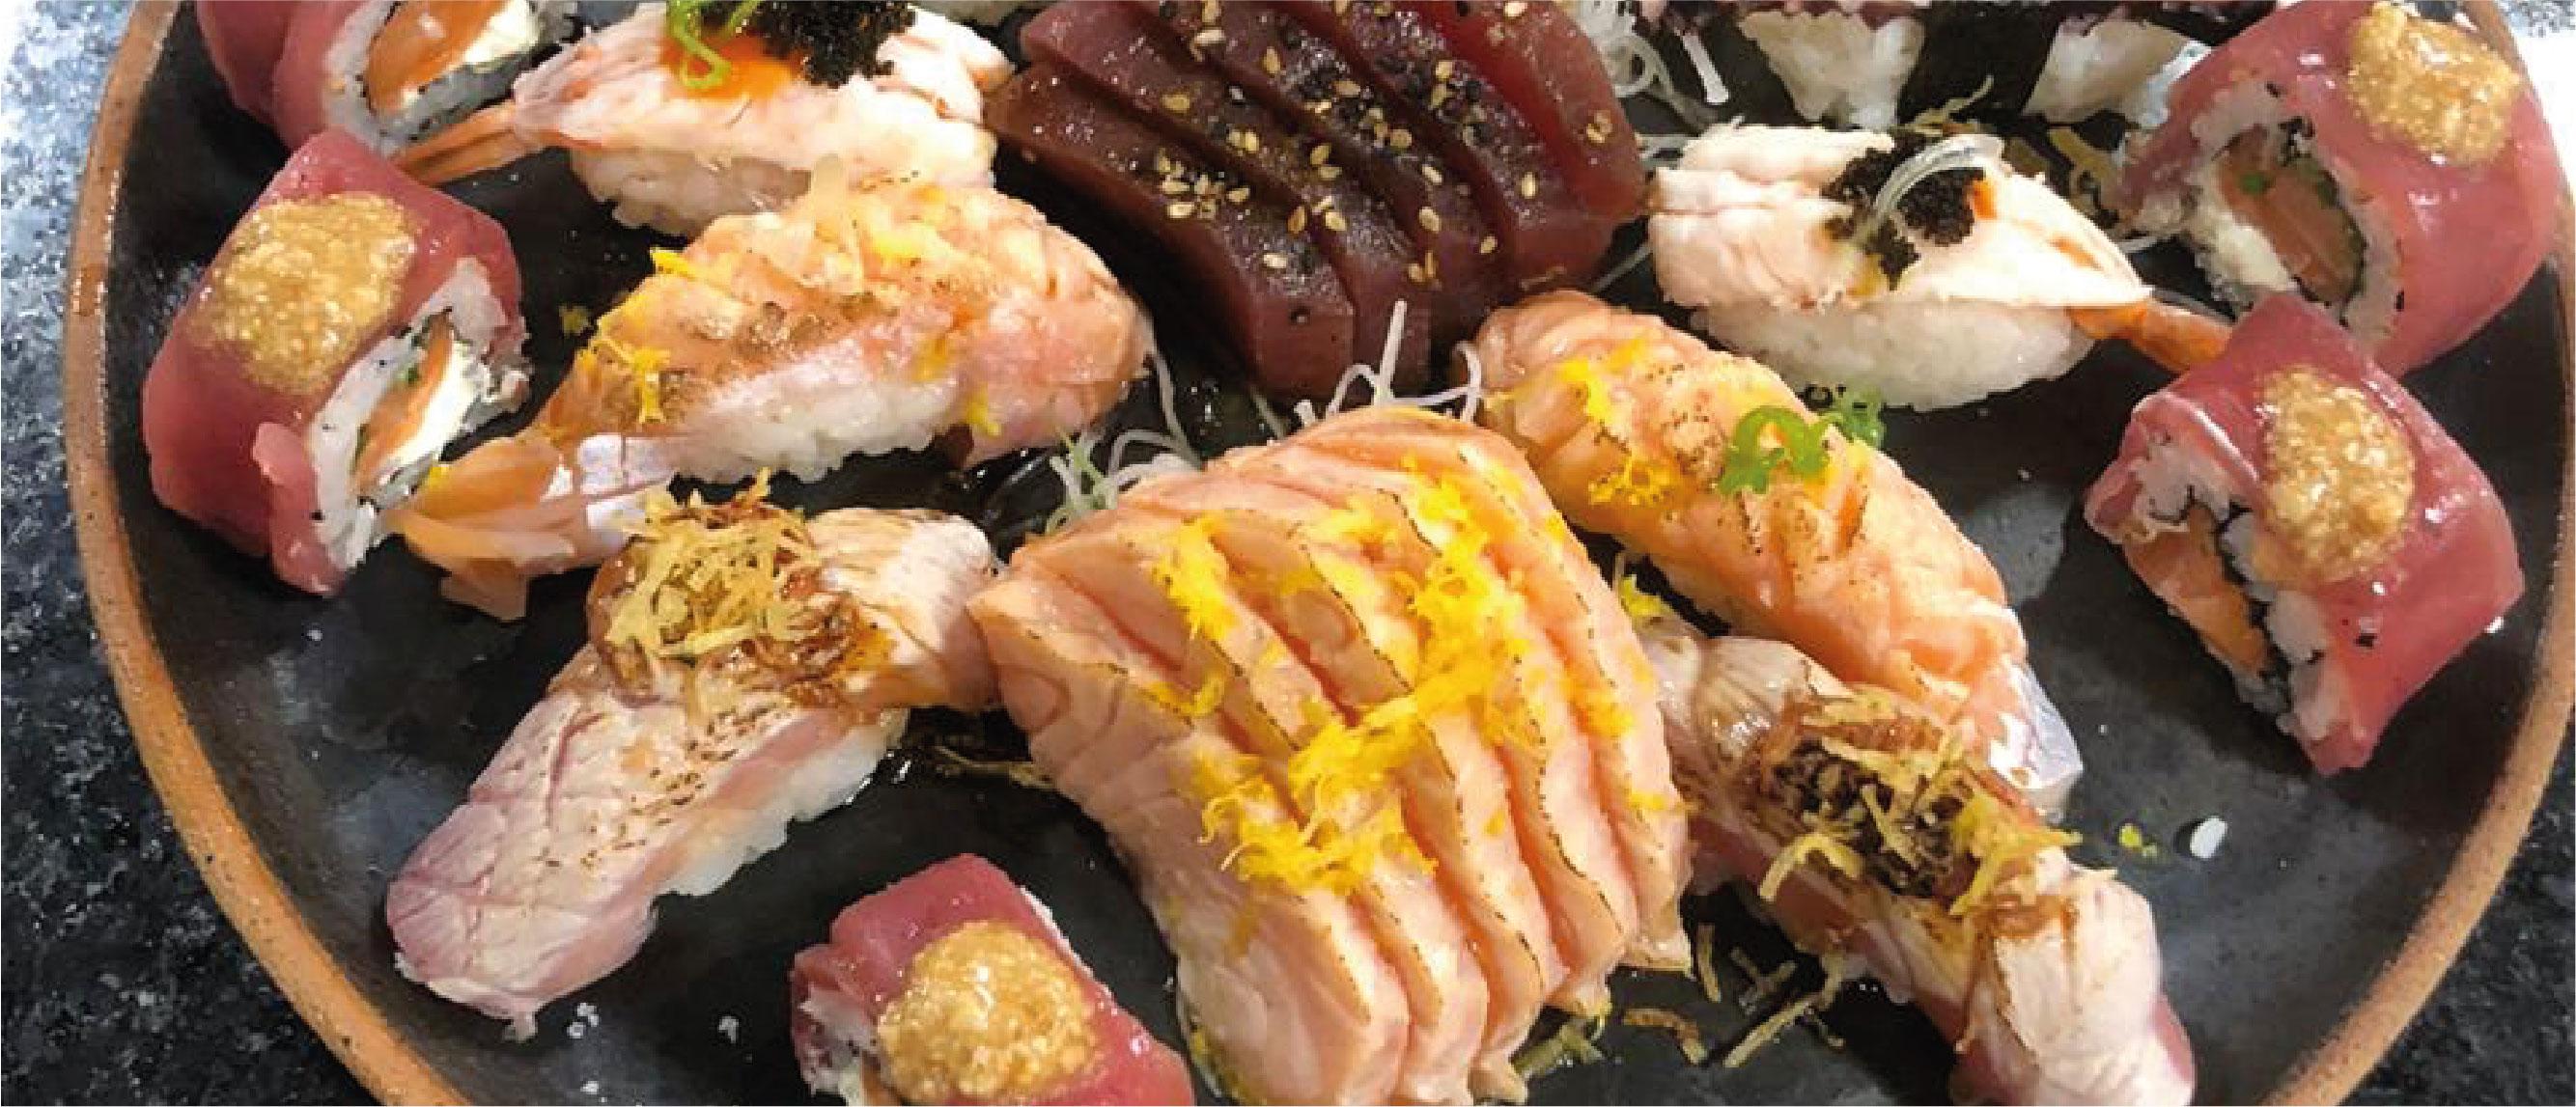 fotos-rj-sushijapa-03